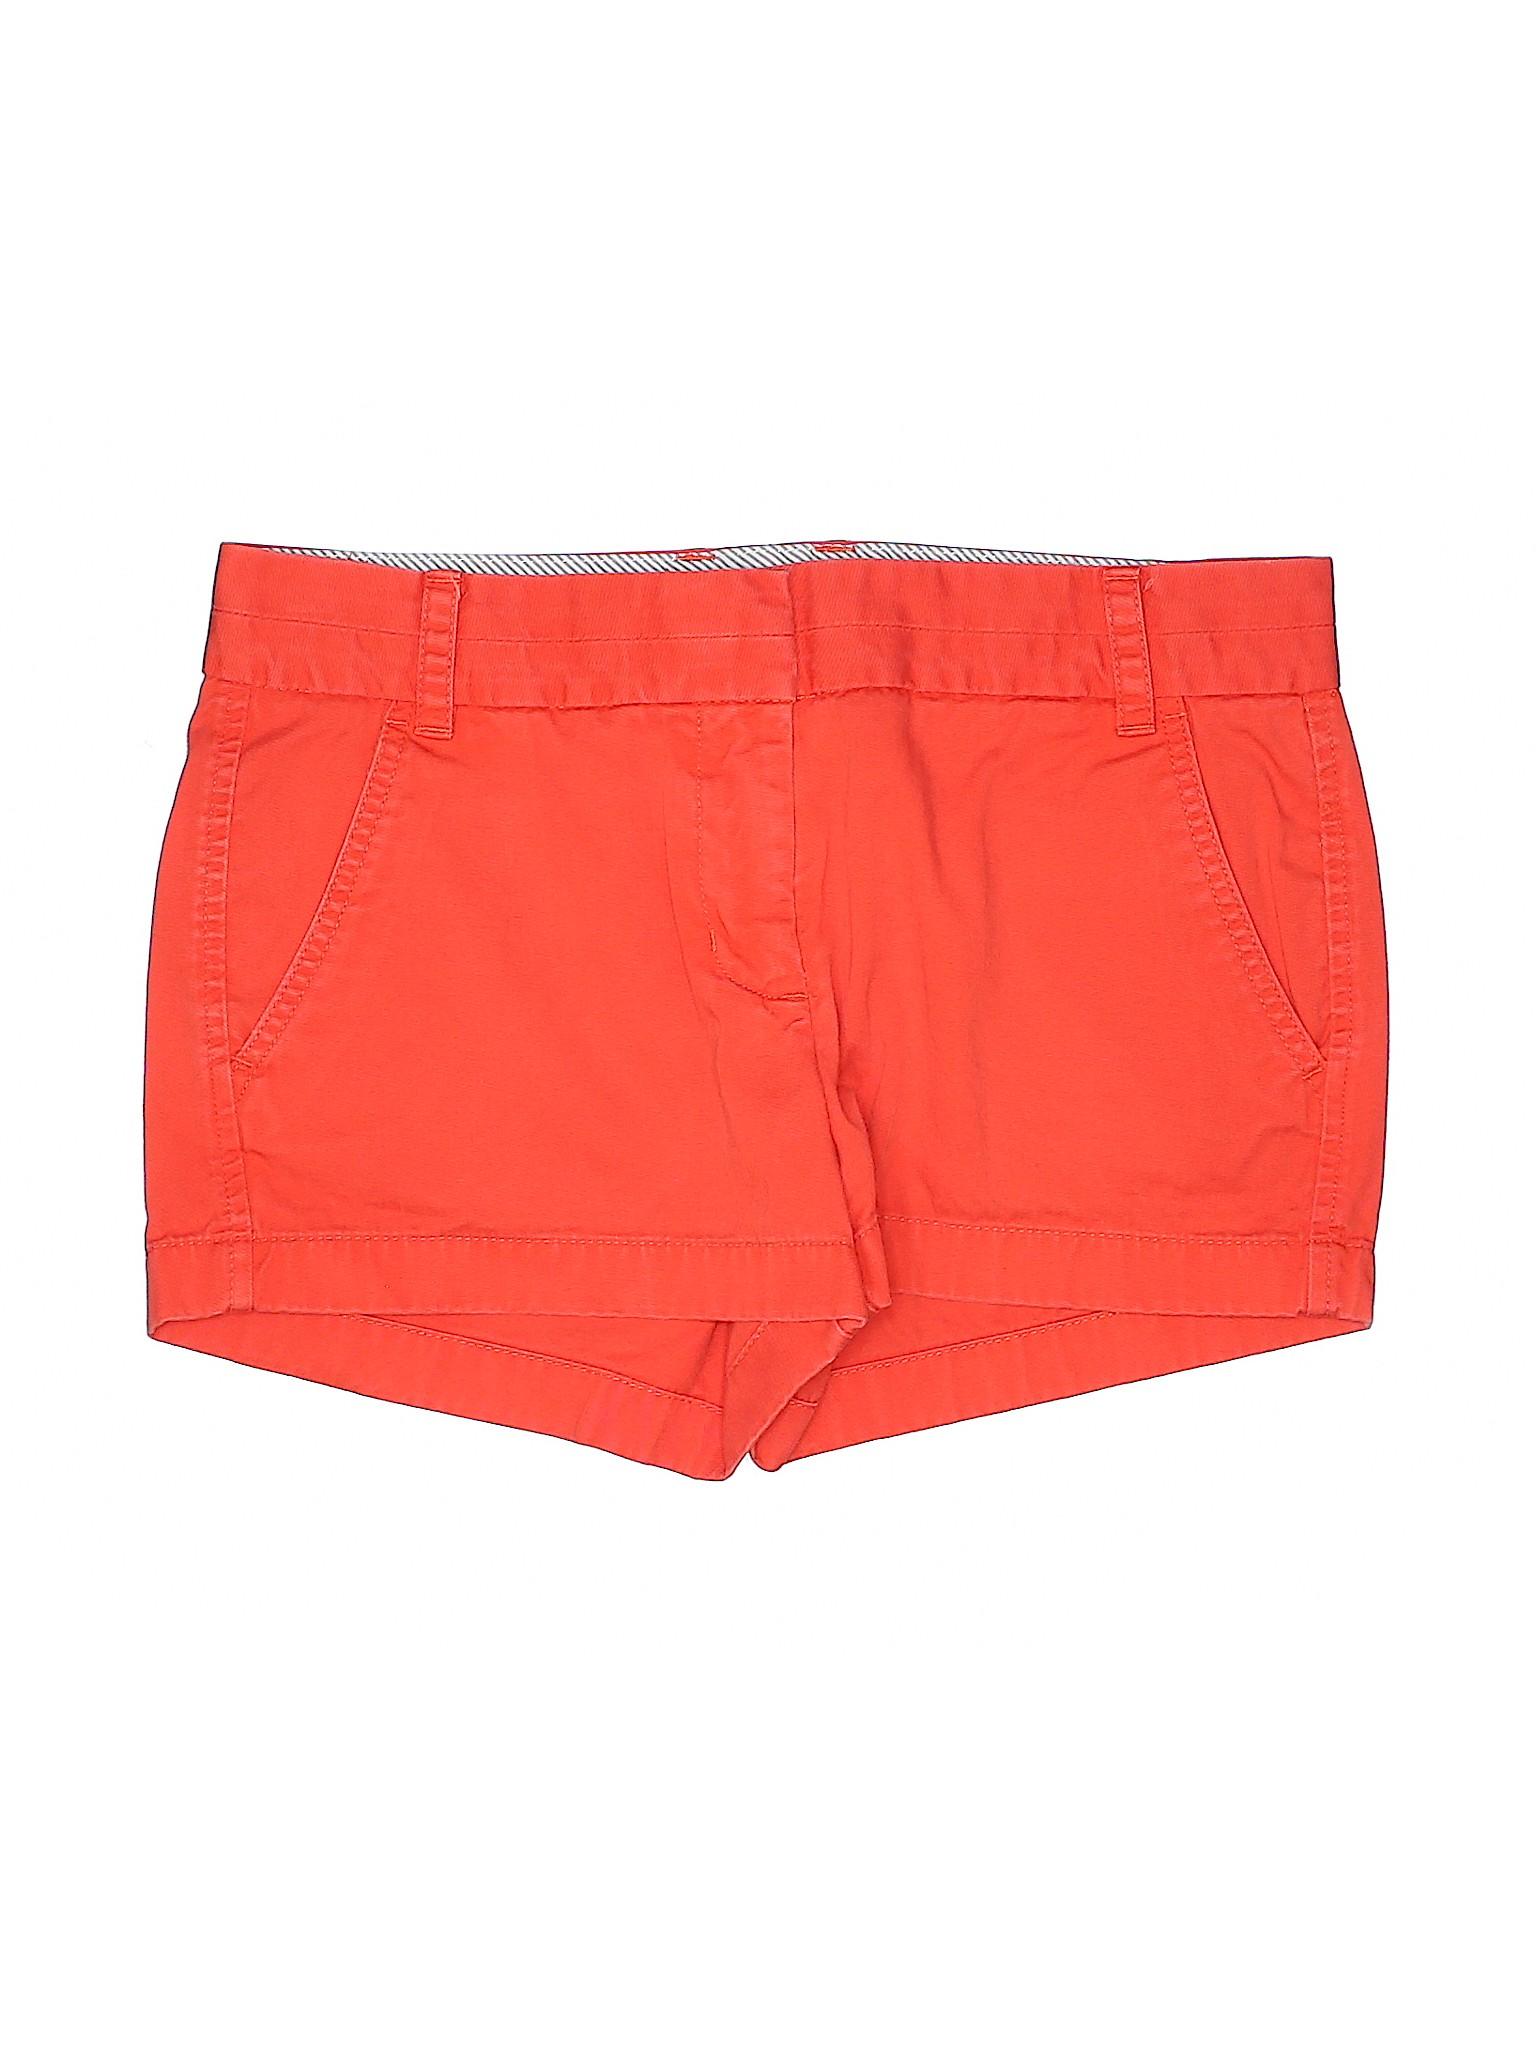 Khaki J winter Crew Boutique Shorts RZzqzf